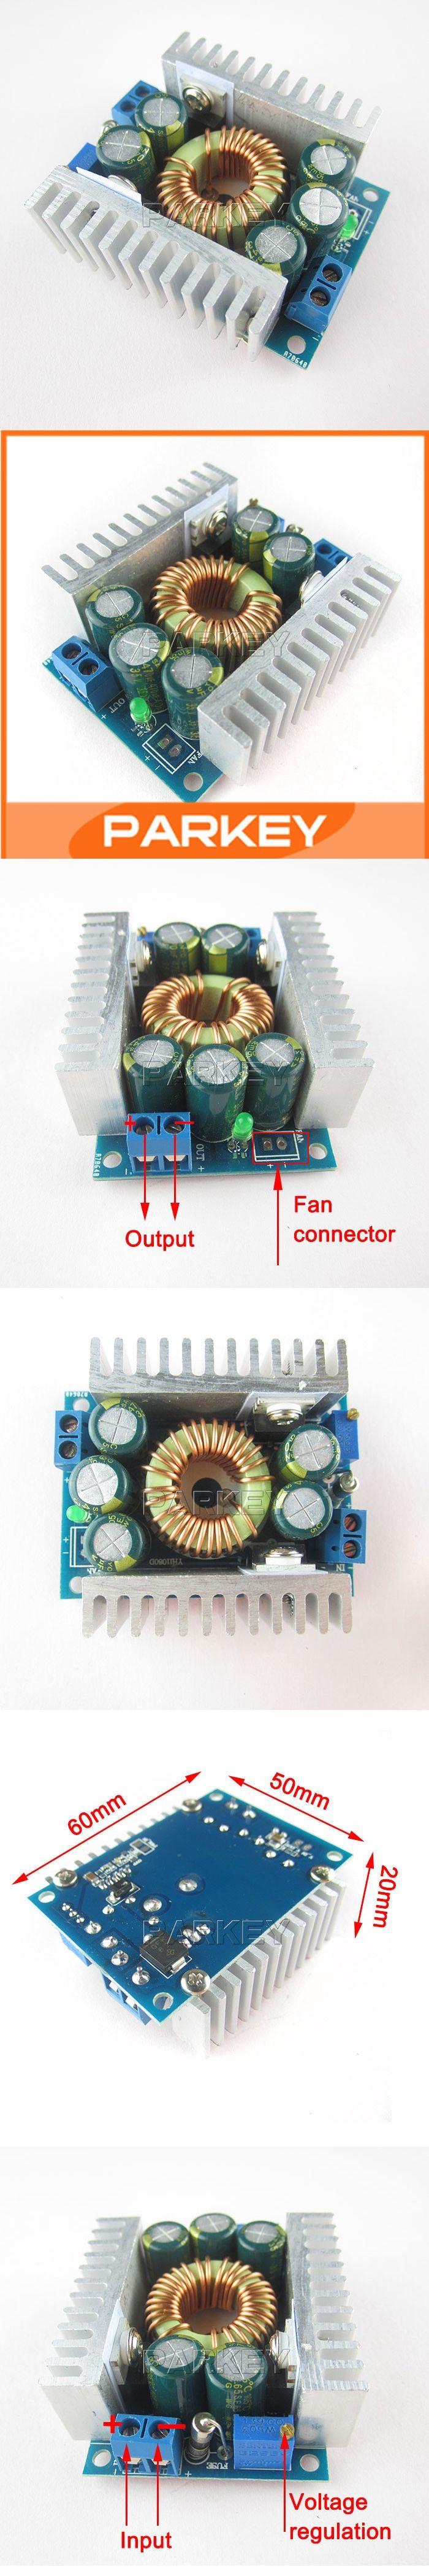 Dc Buck Converter 45 30v To 08 12a Diy Adjustable Regulators High Power